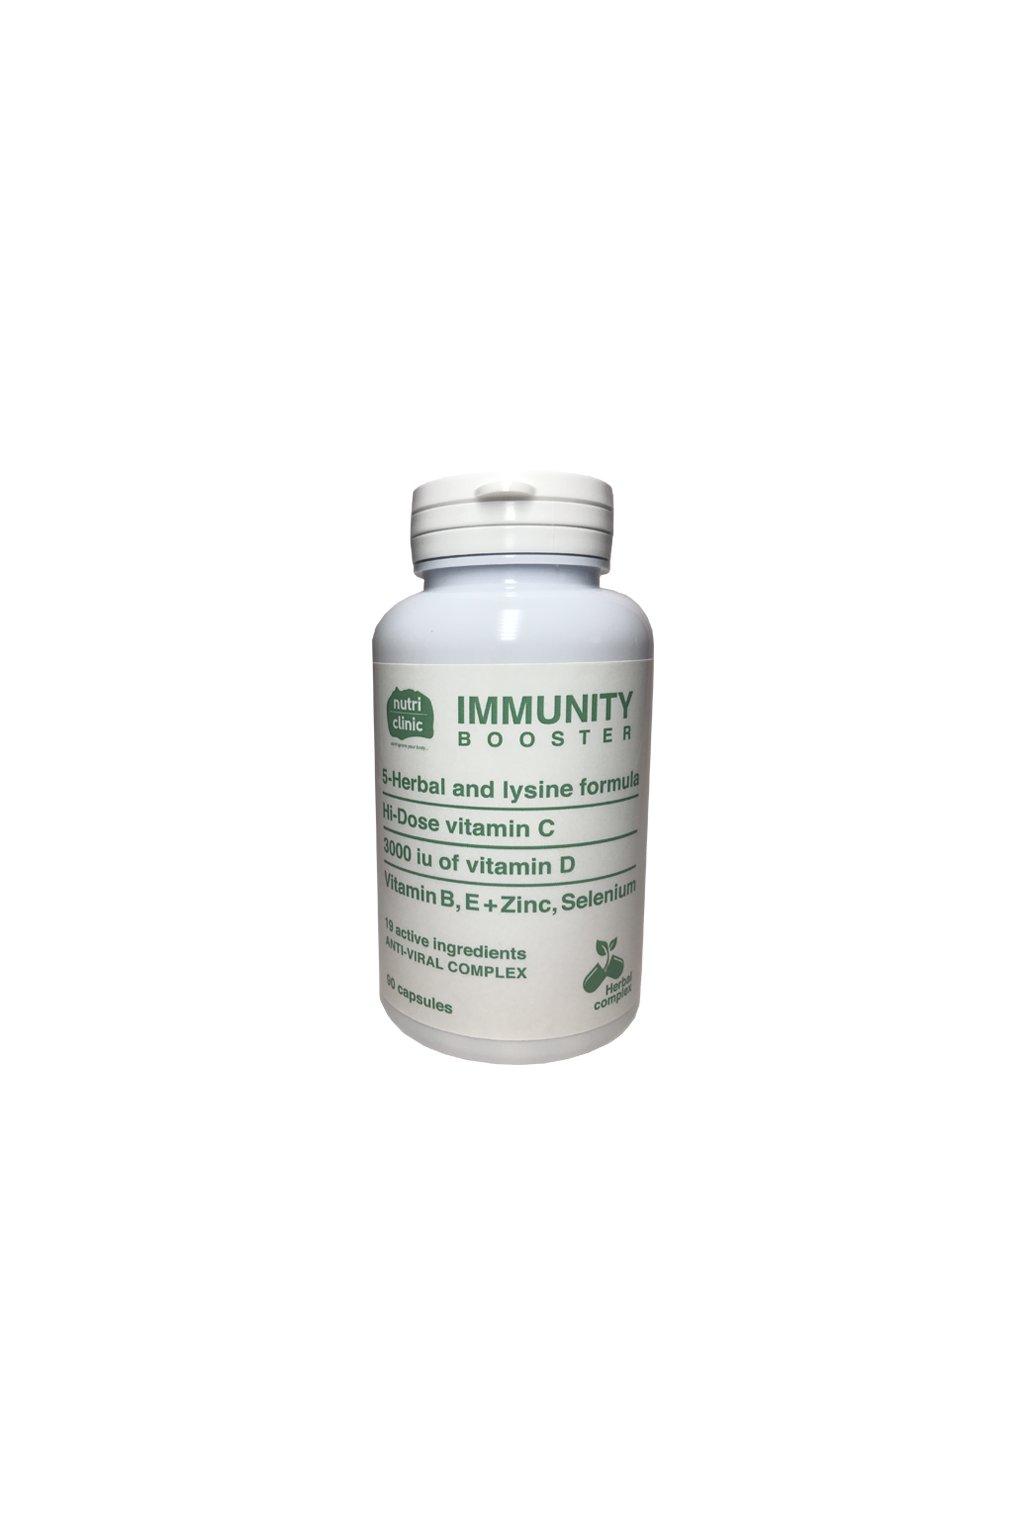 Nutri clinic Immunity booster 800x600